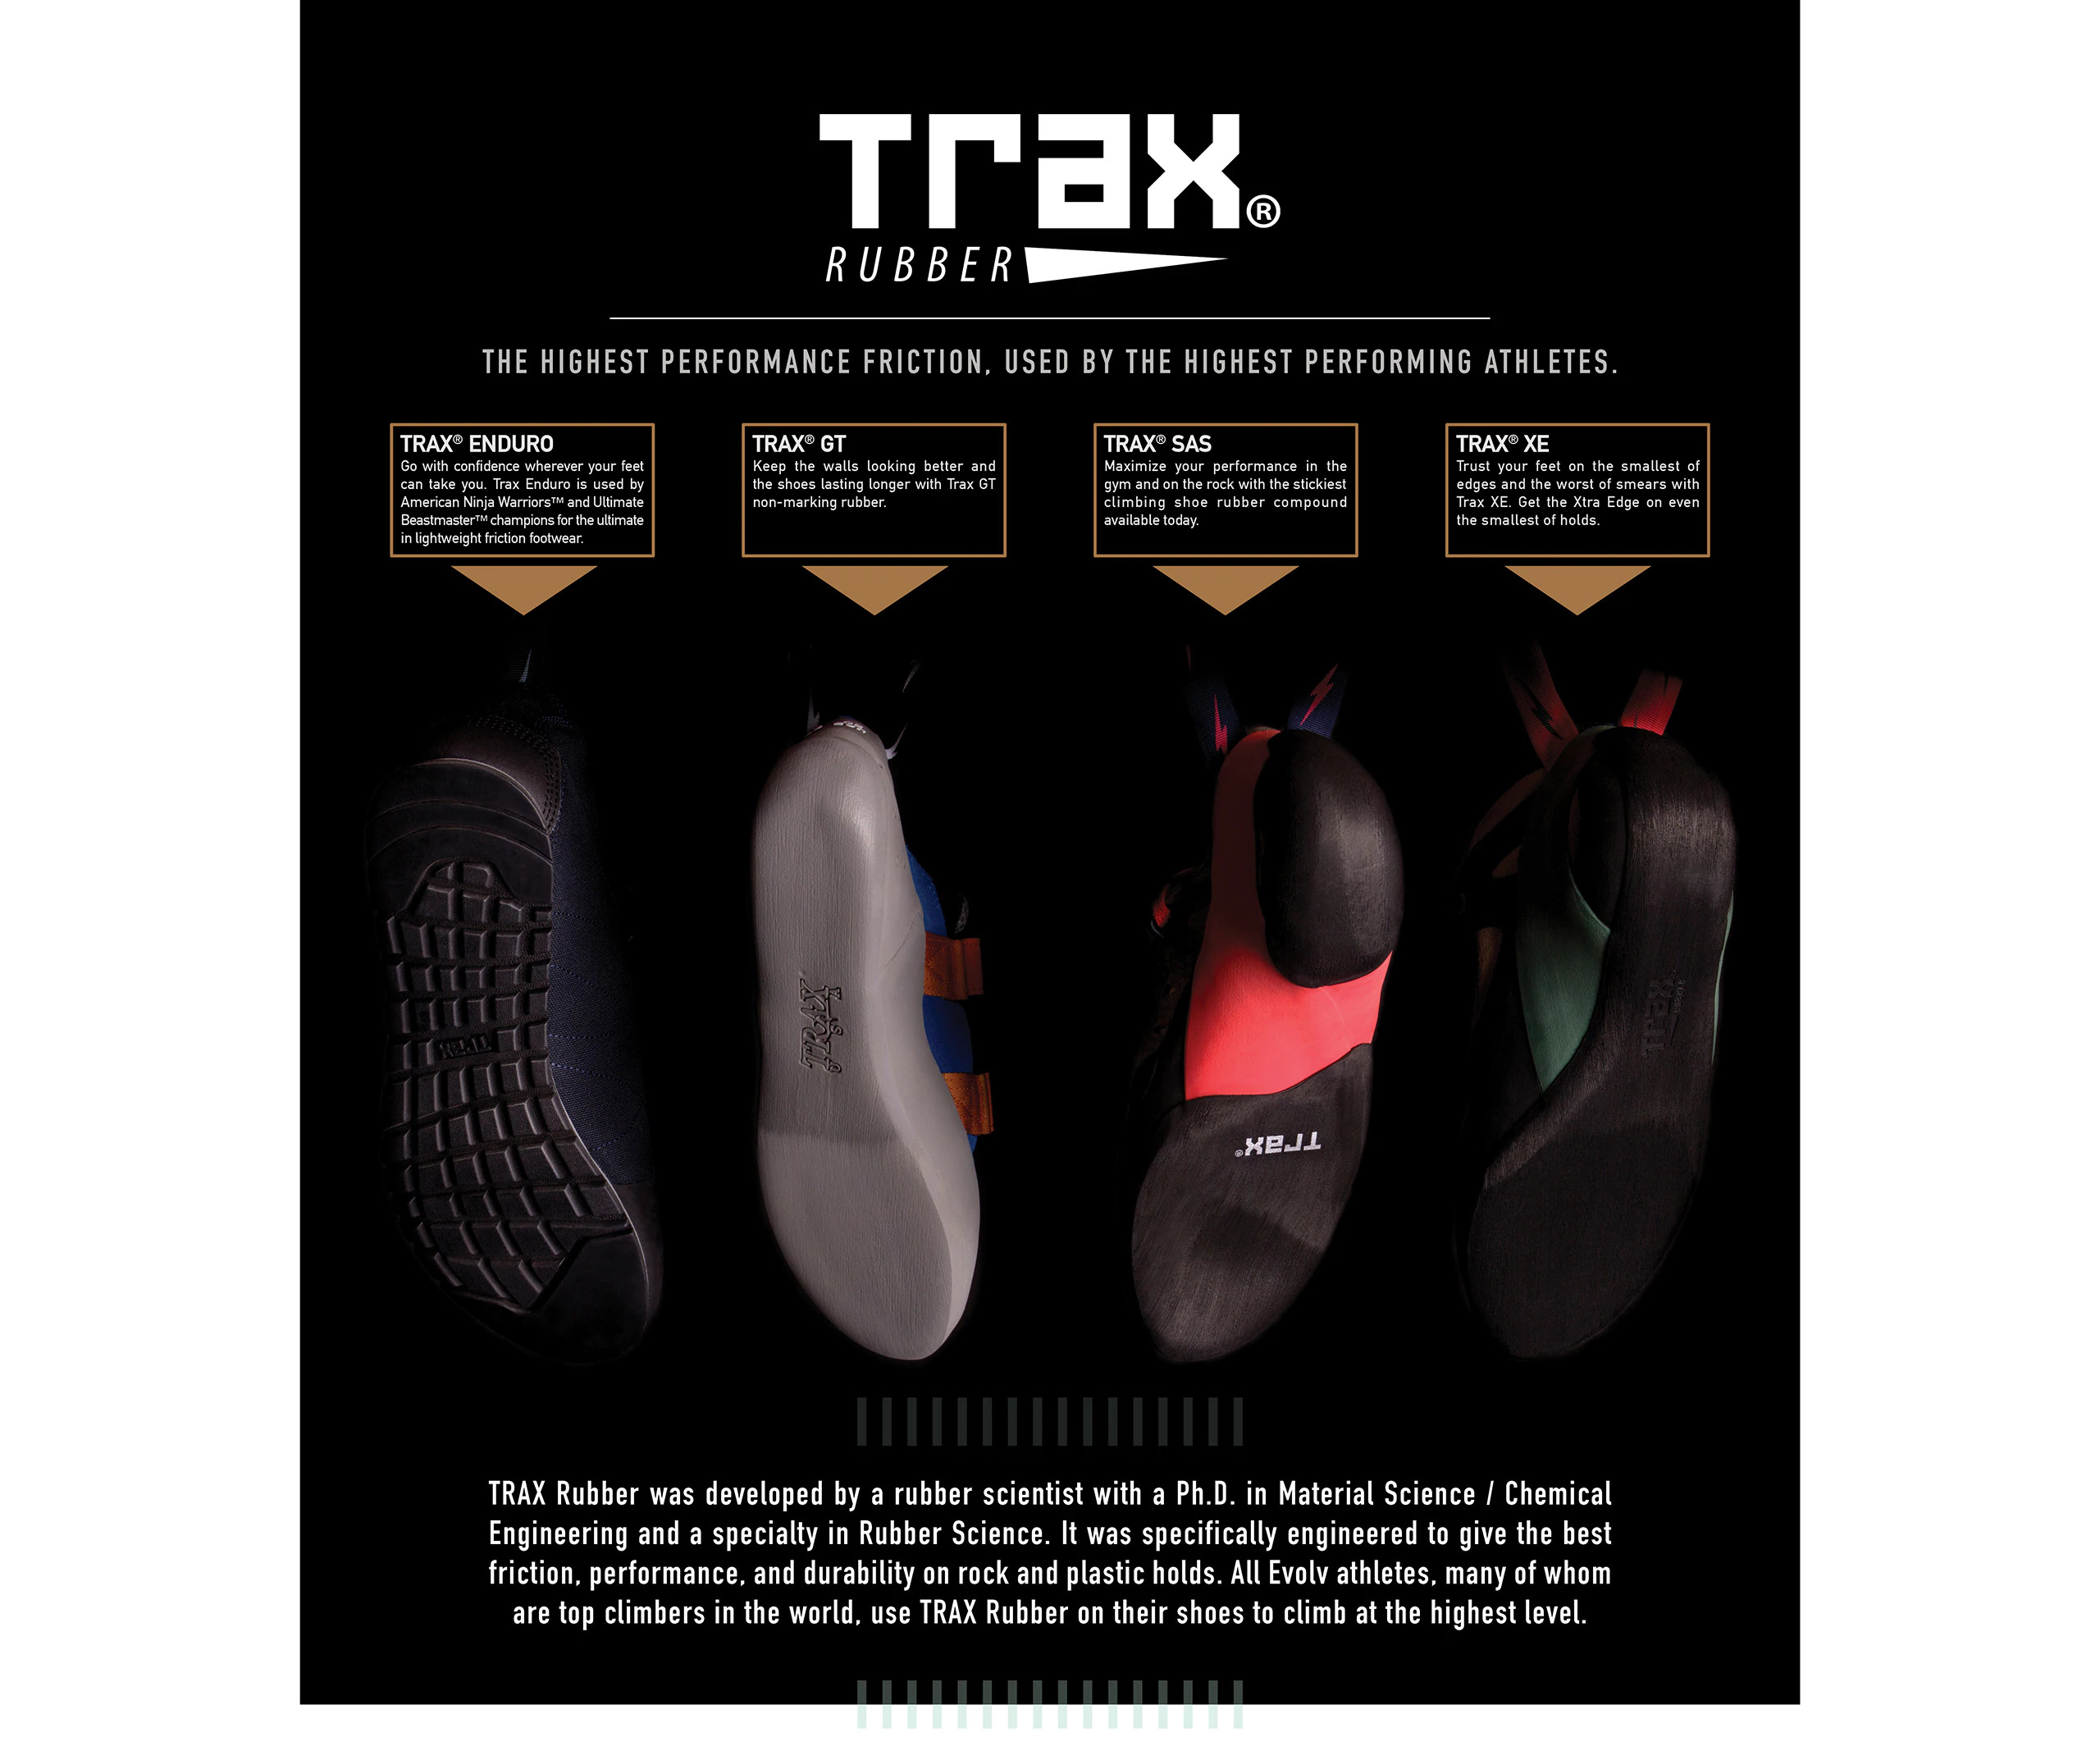 Trax Rubber